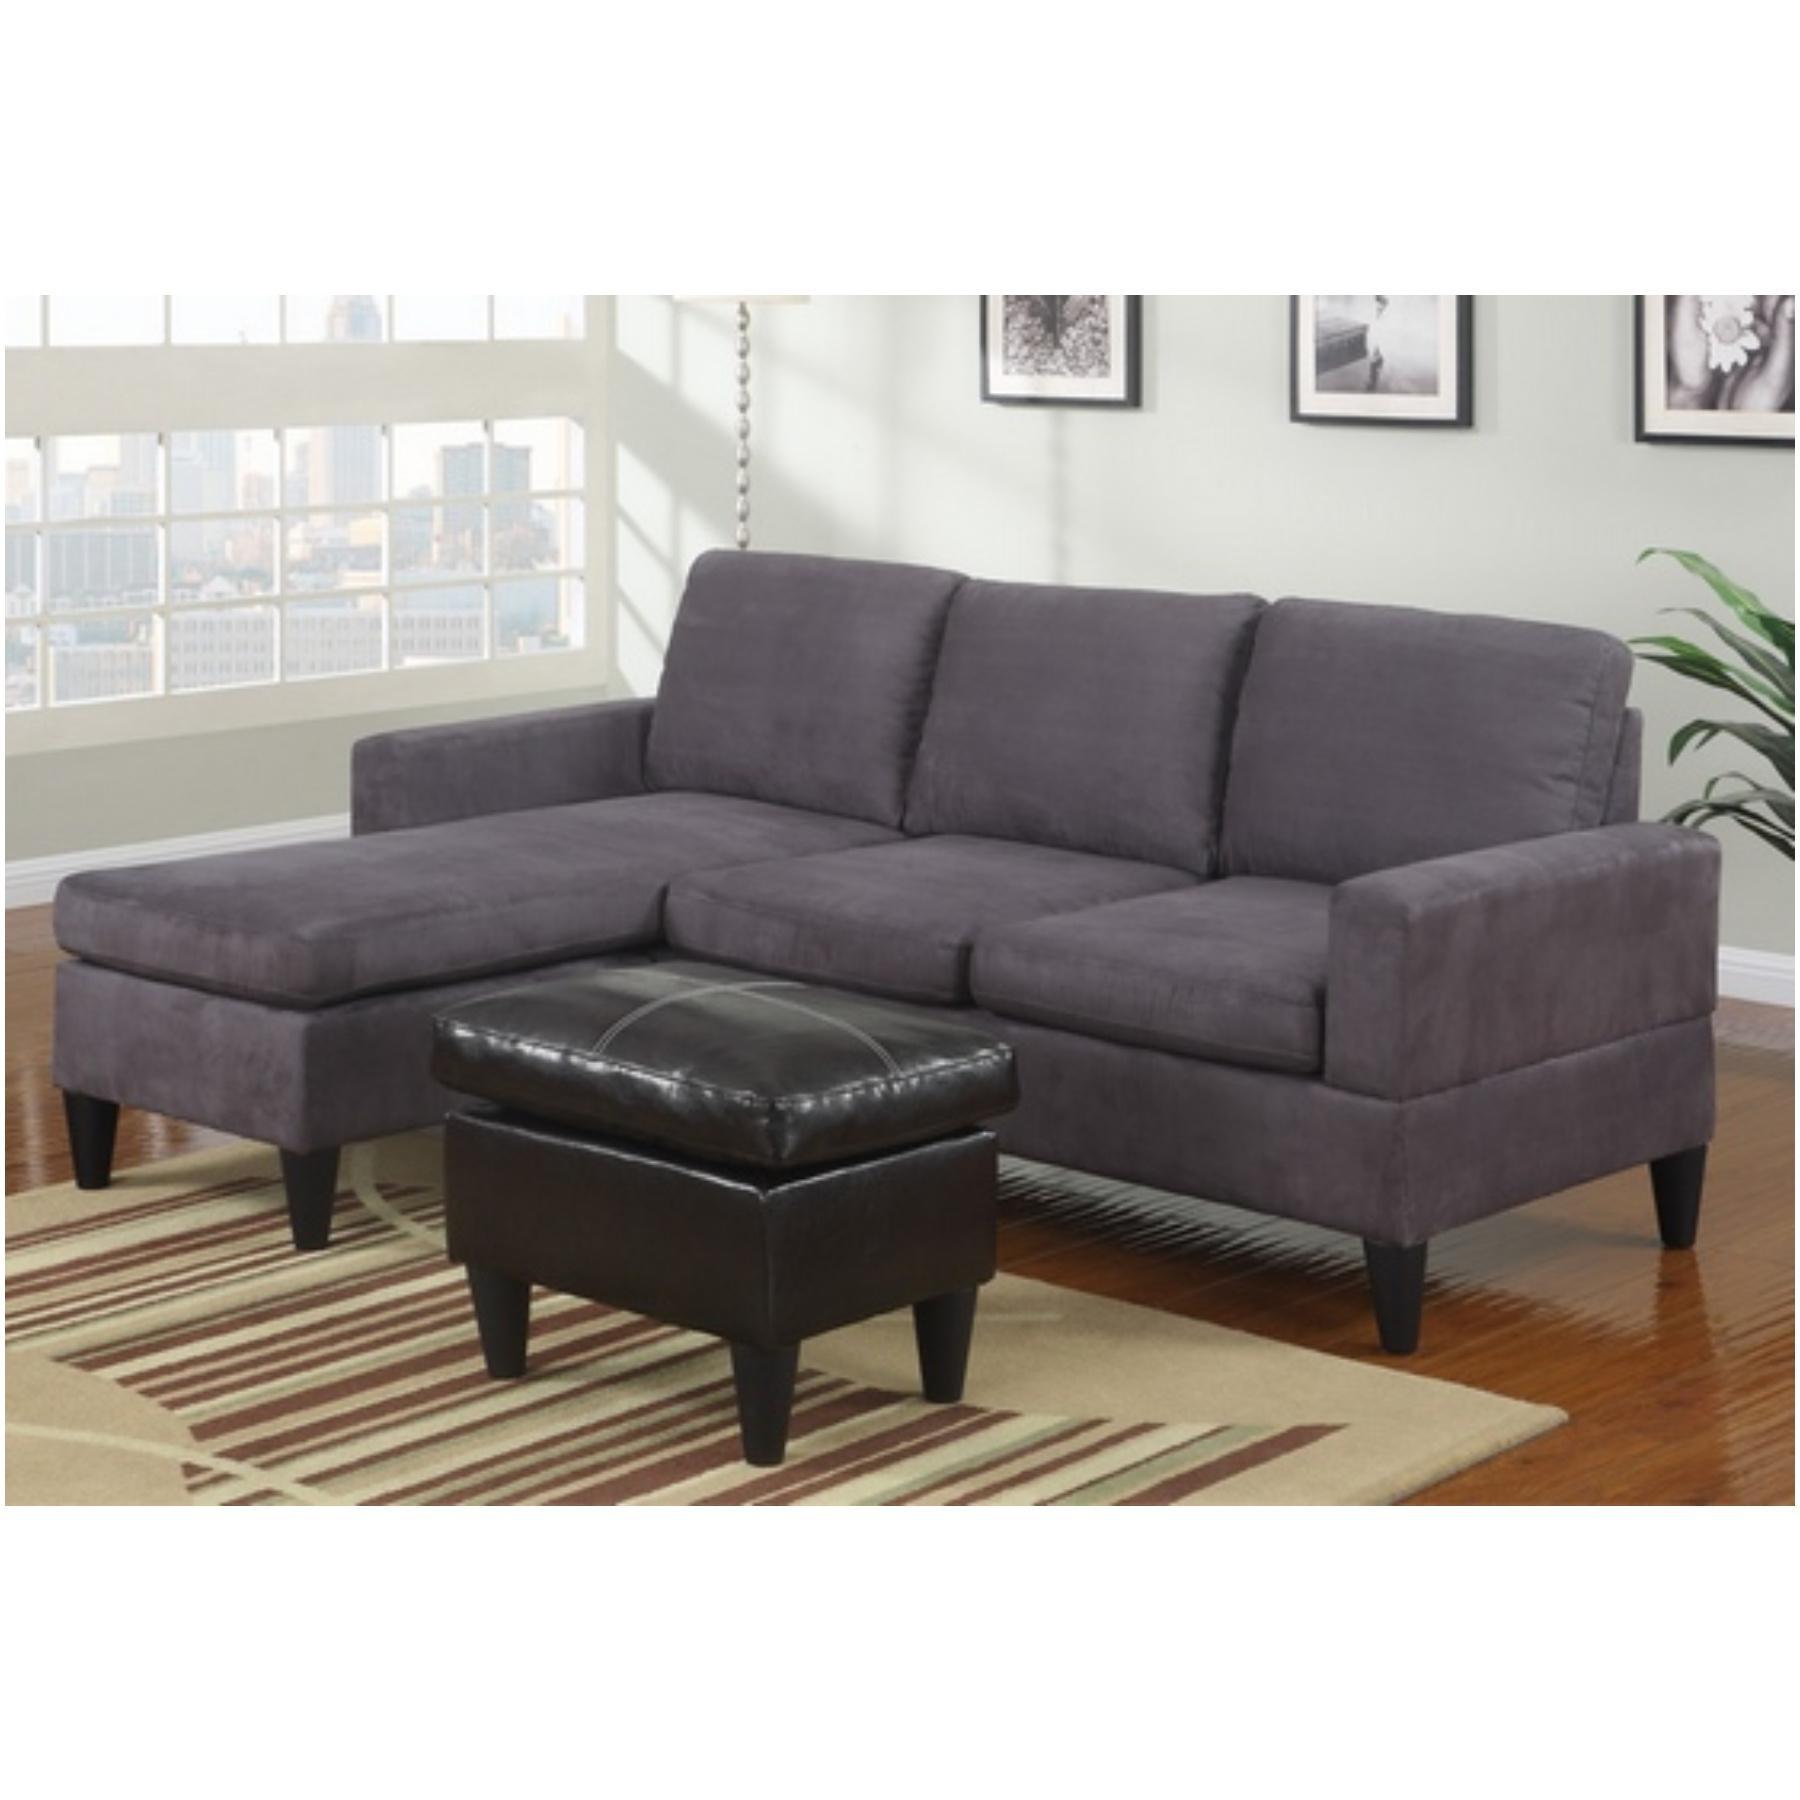 sectional sofas for apartments custom sofa houston tx 2018 latest apartment ideas